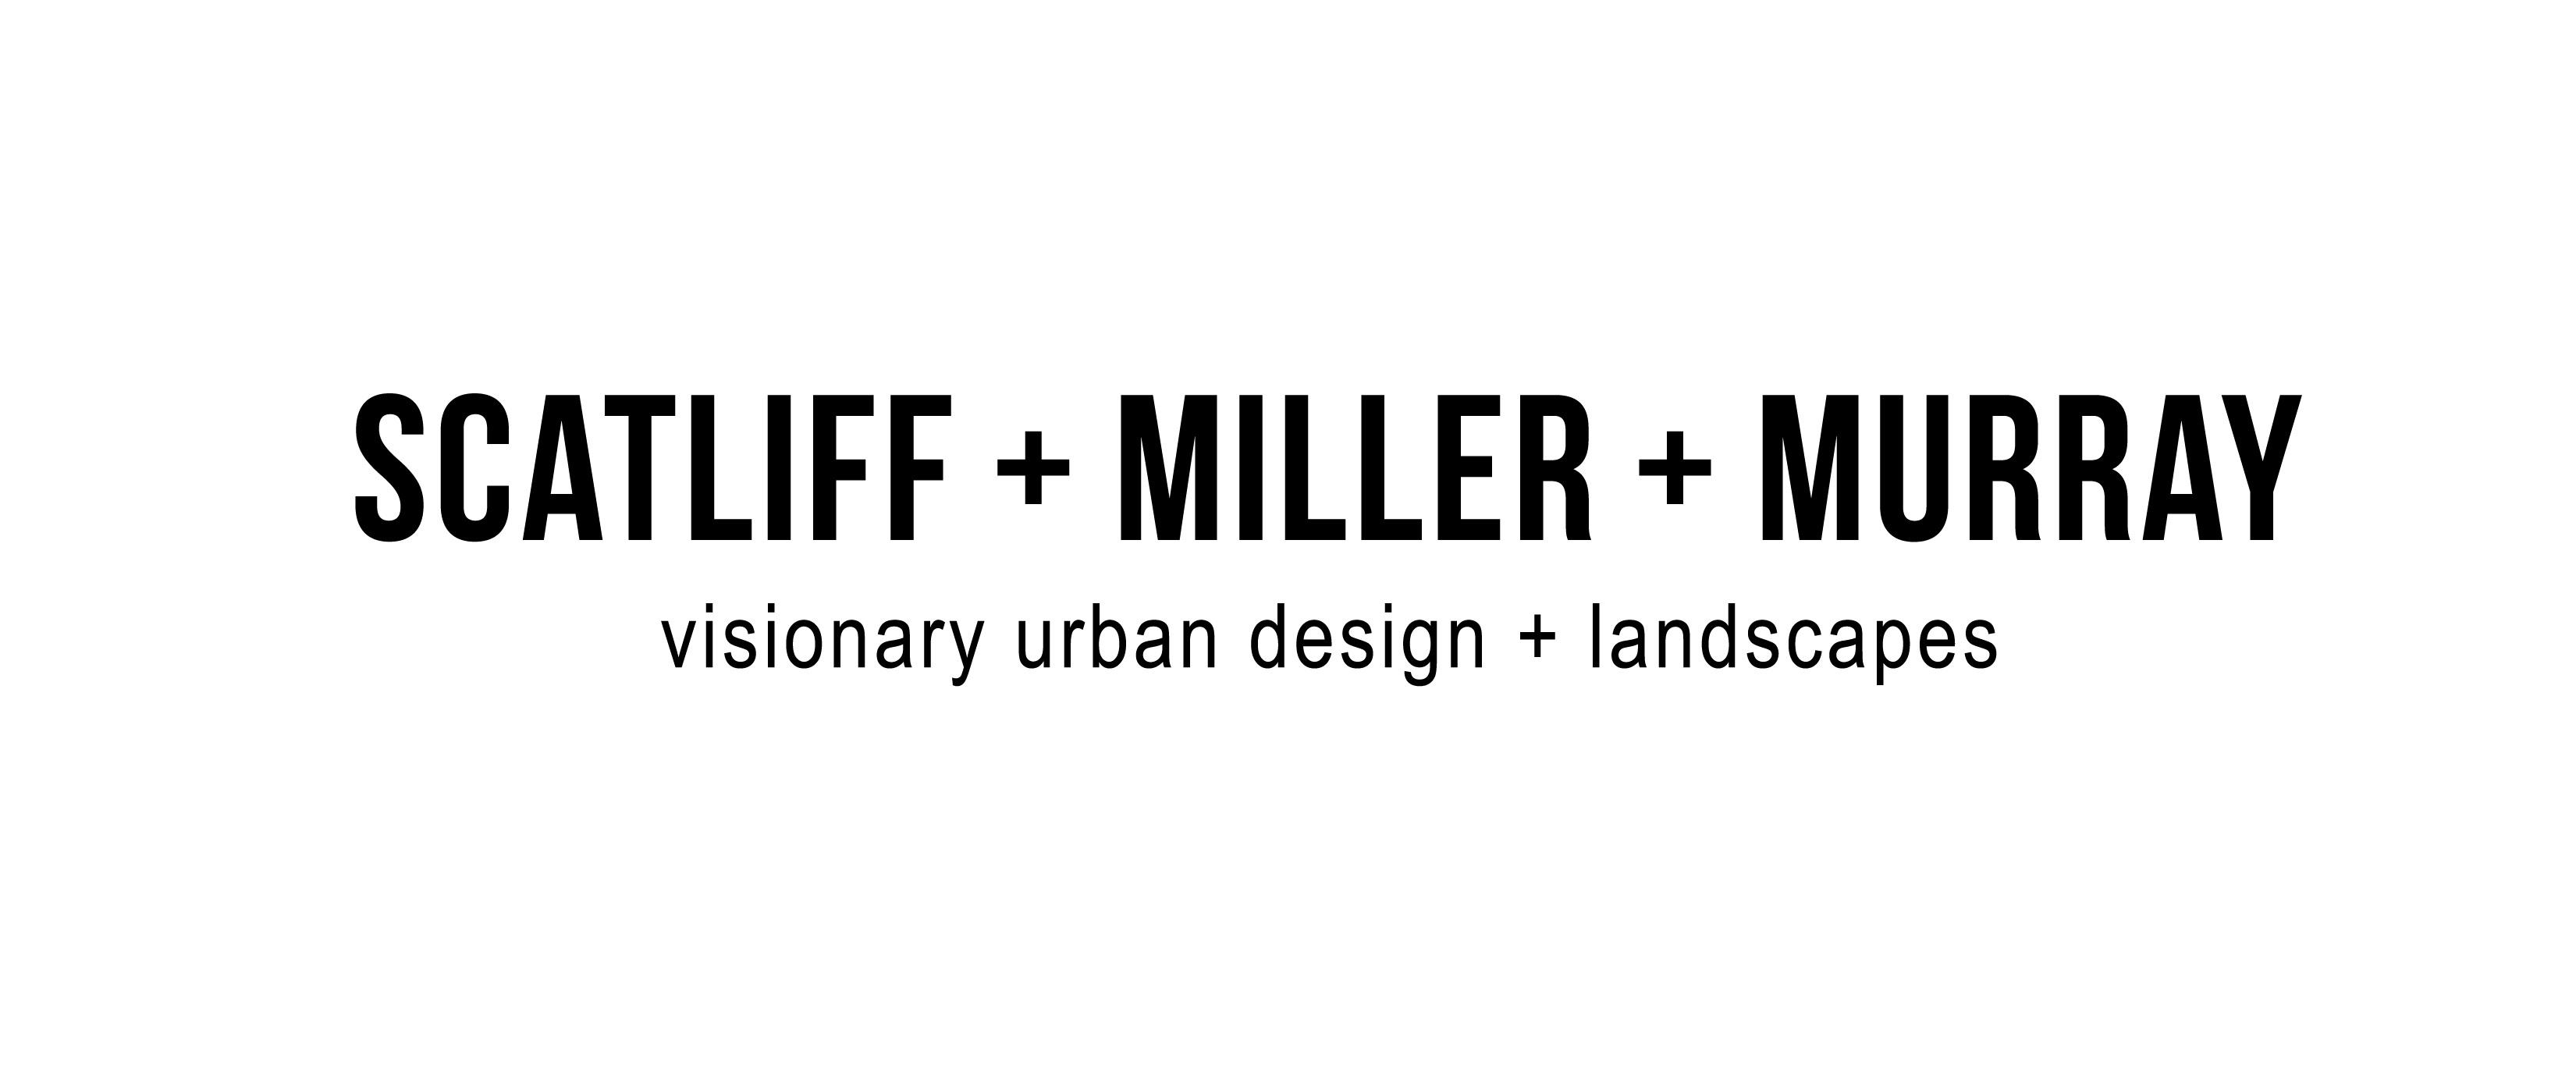 Scatliff + Miller + Murray - solid_smm_logo-01_1